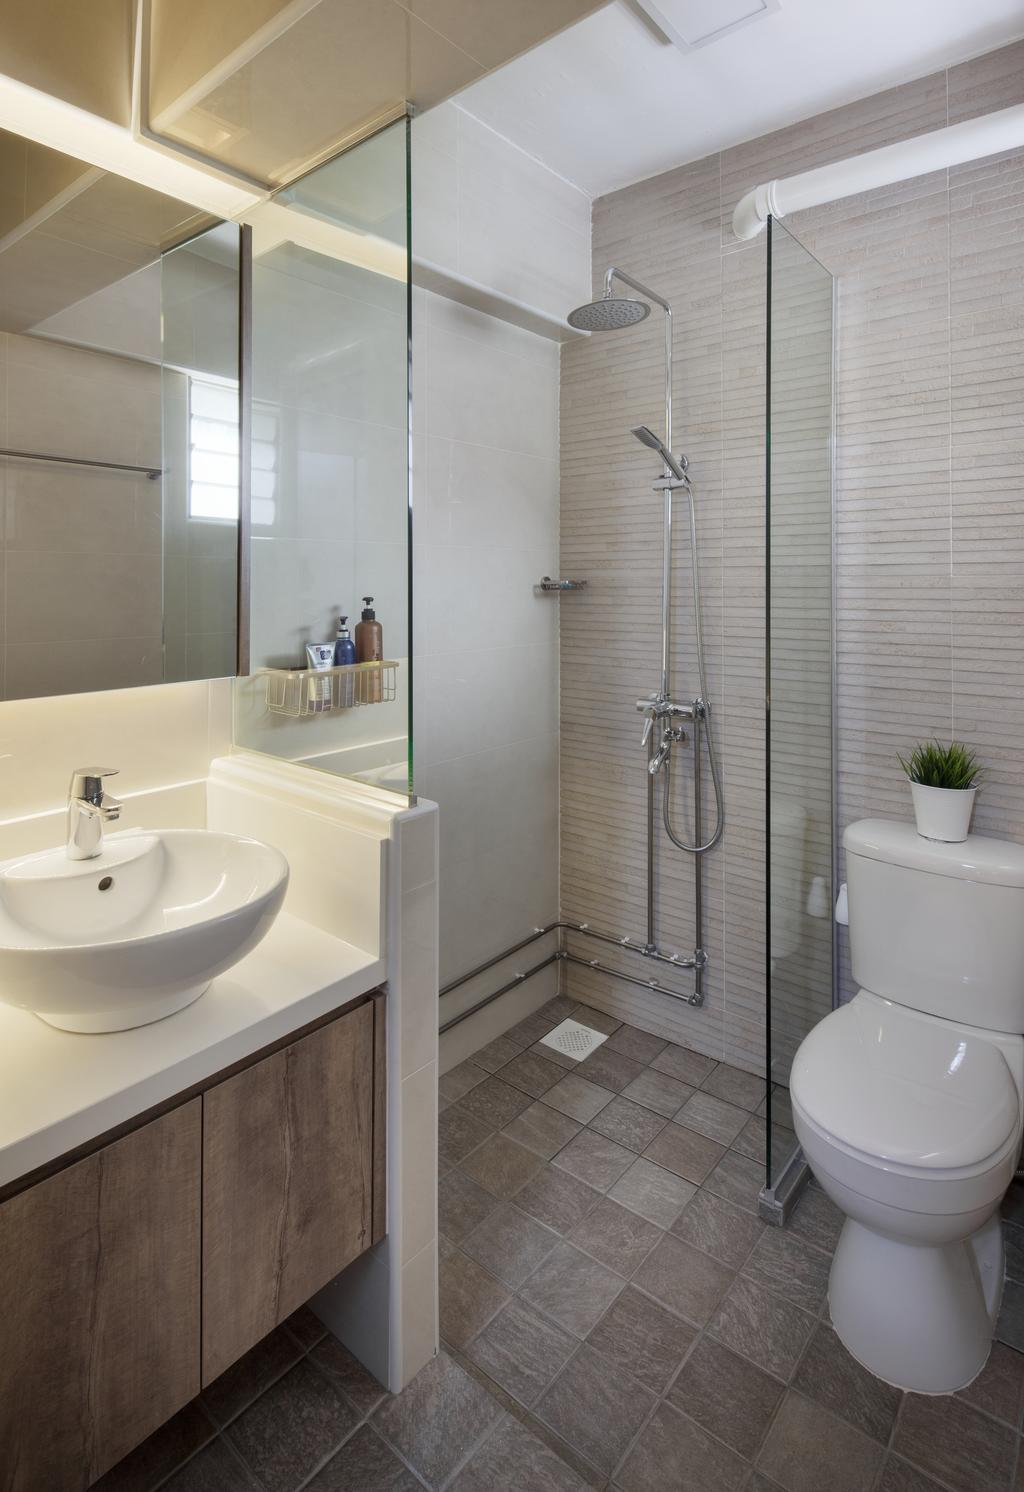 Transitional, HDB, Bathroom, Clementi (Block 358), Interior Designer, Weiken.com, Indoors, Interior Design, Room